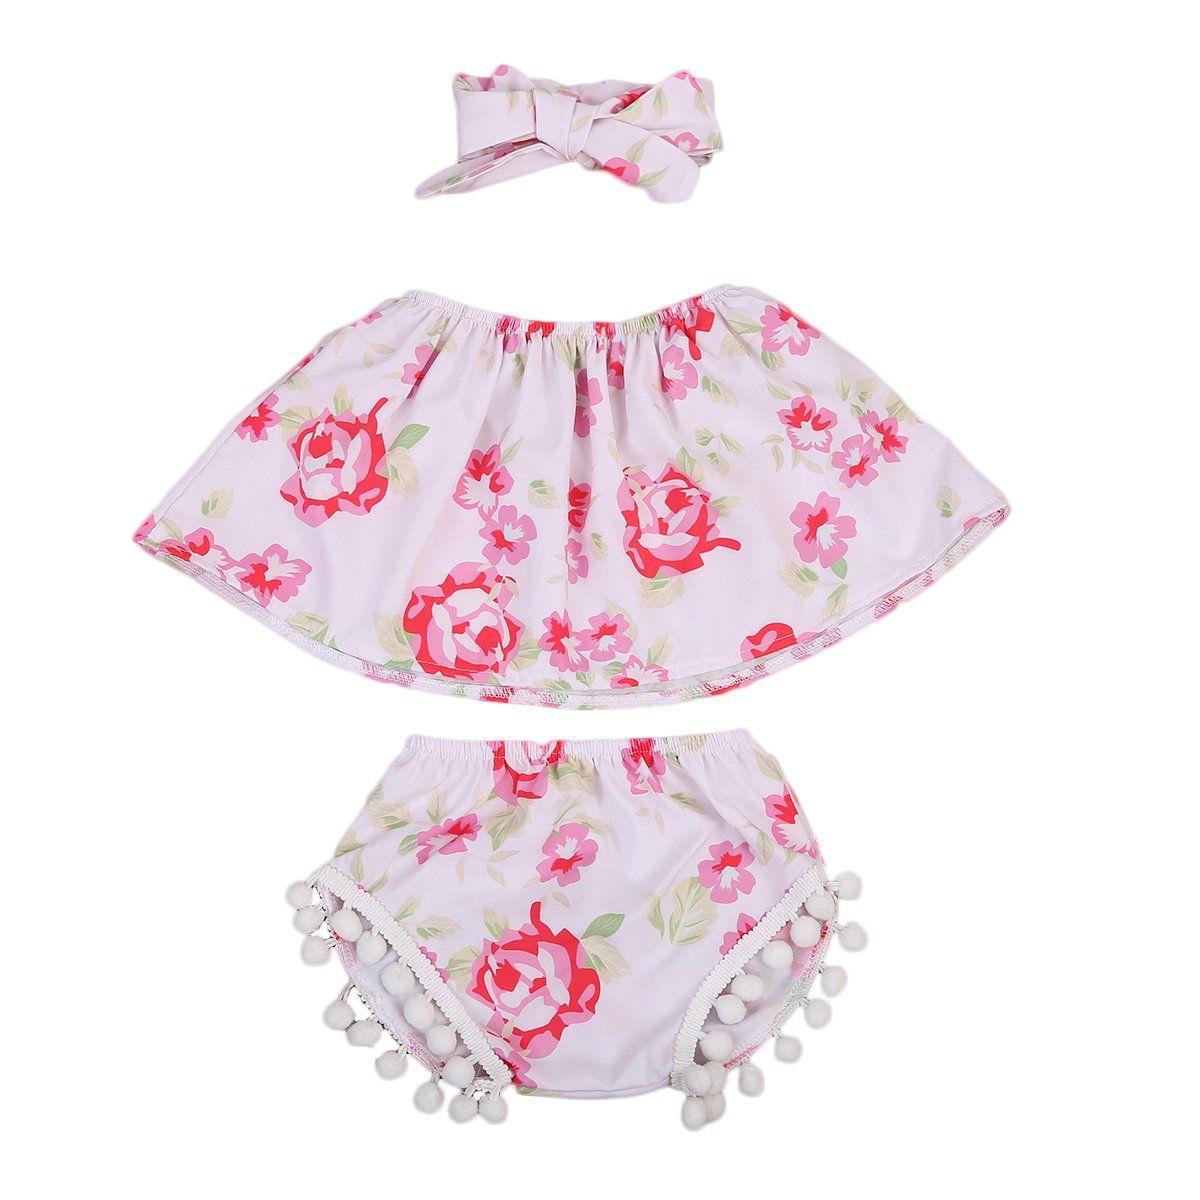 d63e3401d93c 3Pcs Newborn Baby Girls Clothing Set Sleeveless Floral Tube Top + Tassel  Shorts + Headband 3PCS Outfits Clothes